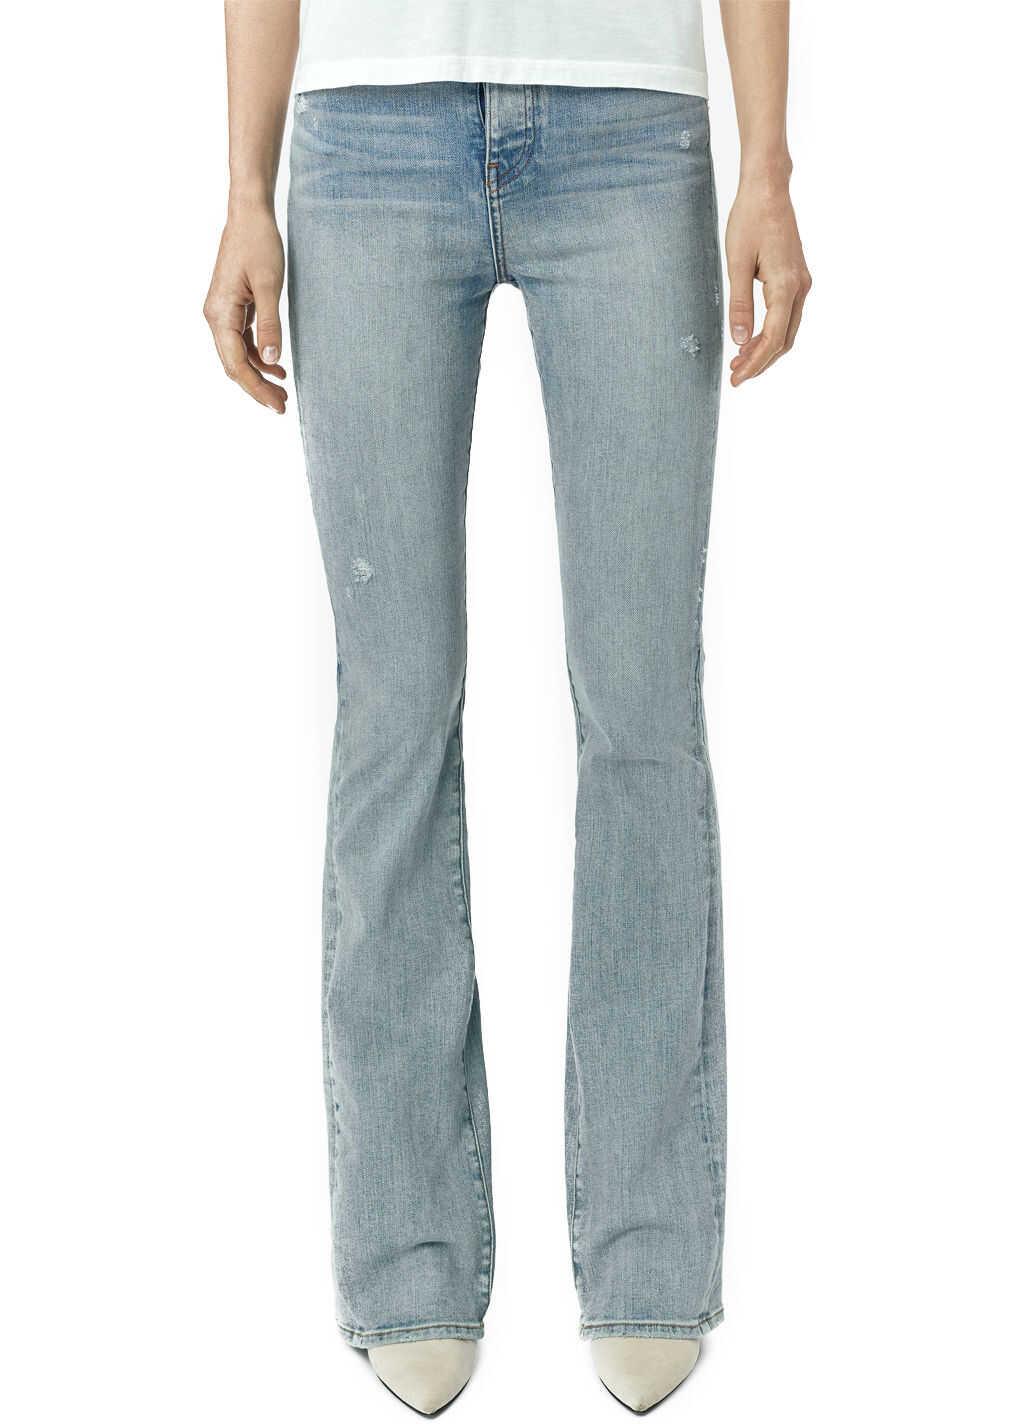 AMIRI Jeans Blue